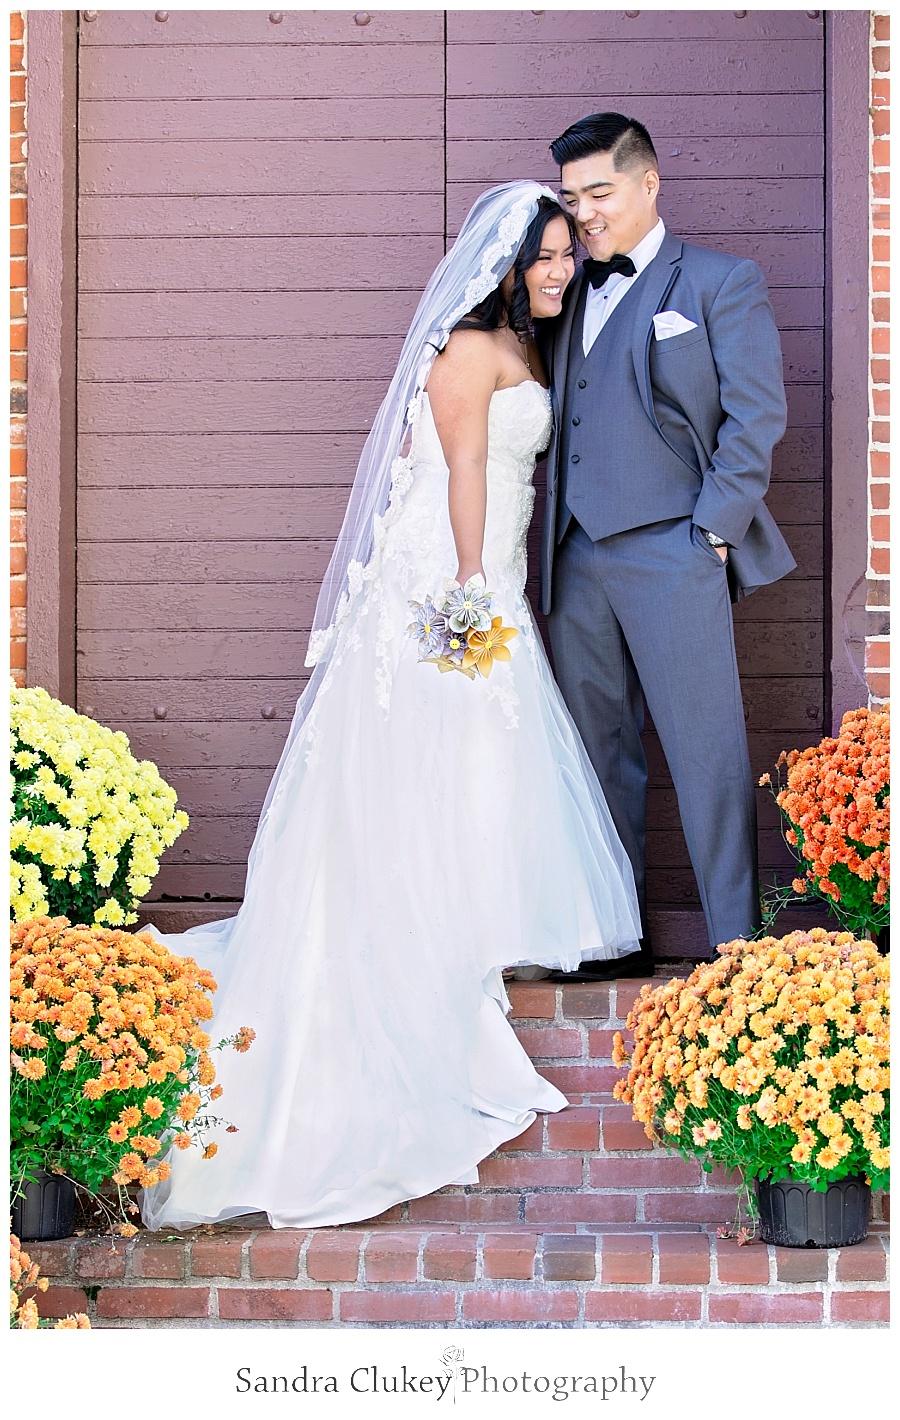 Pre-wedding sharing